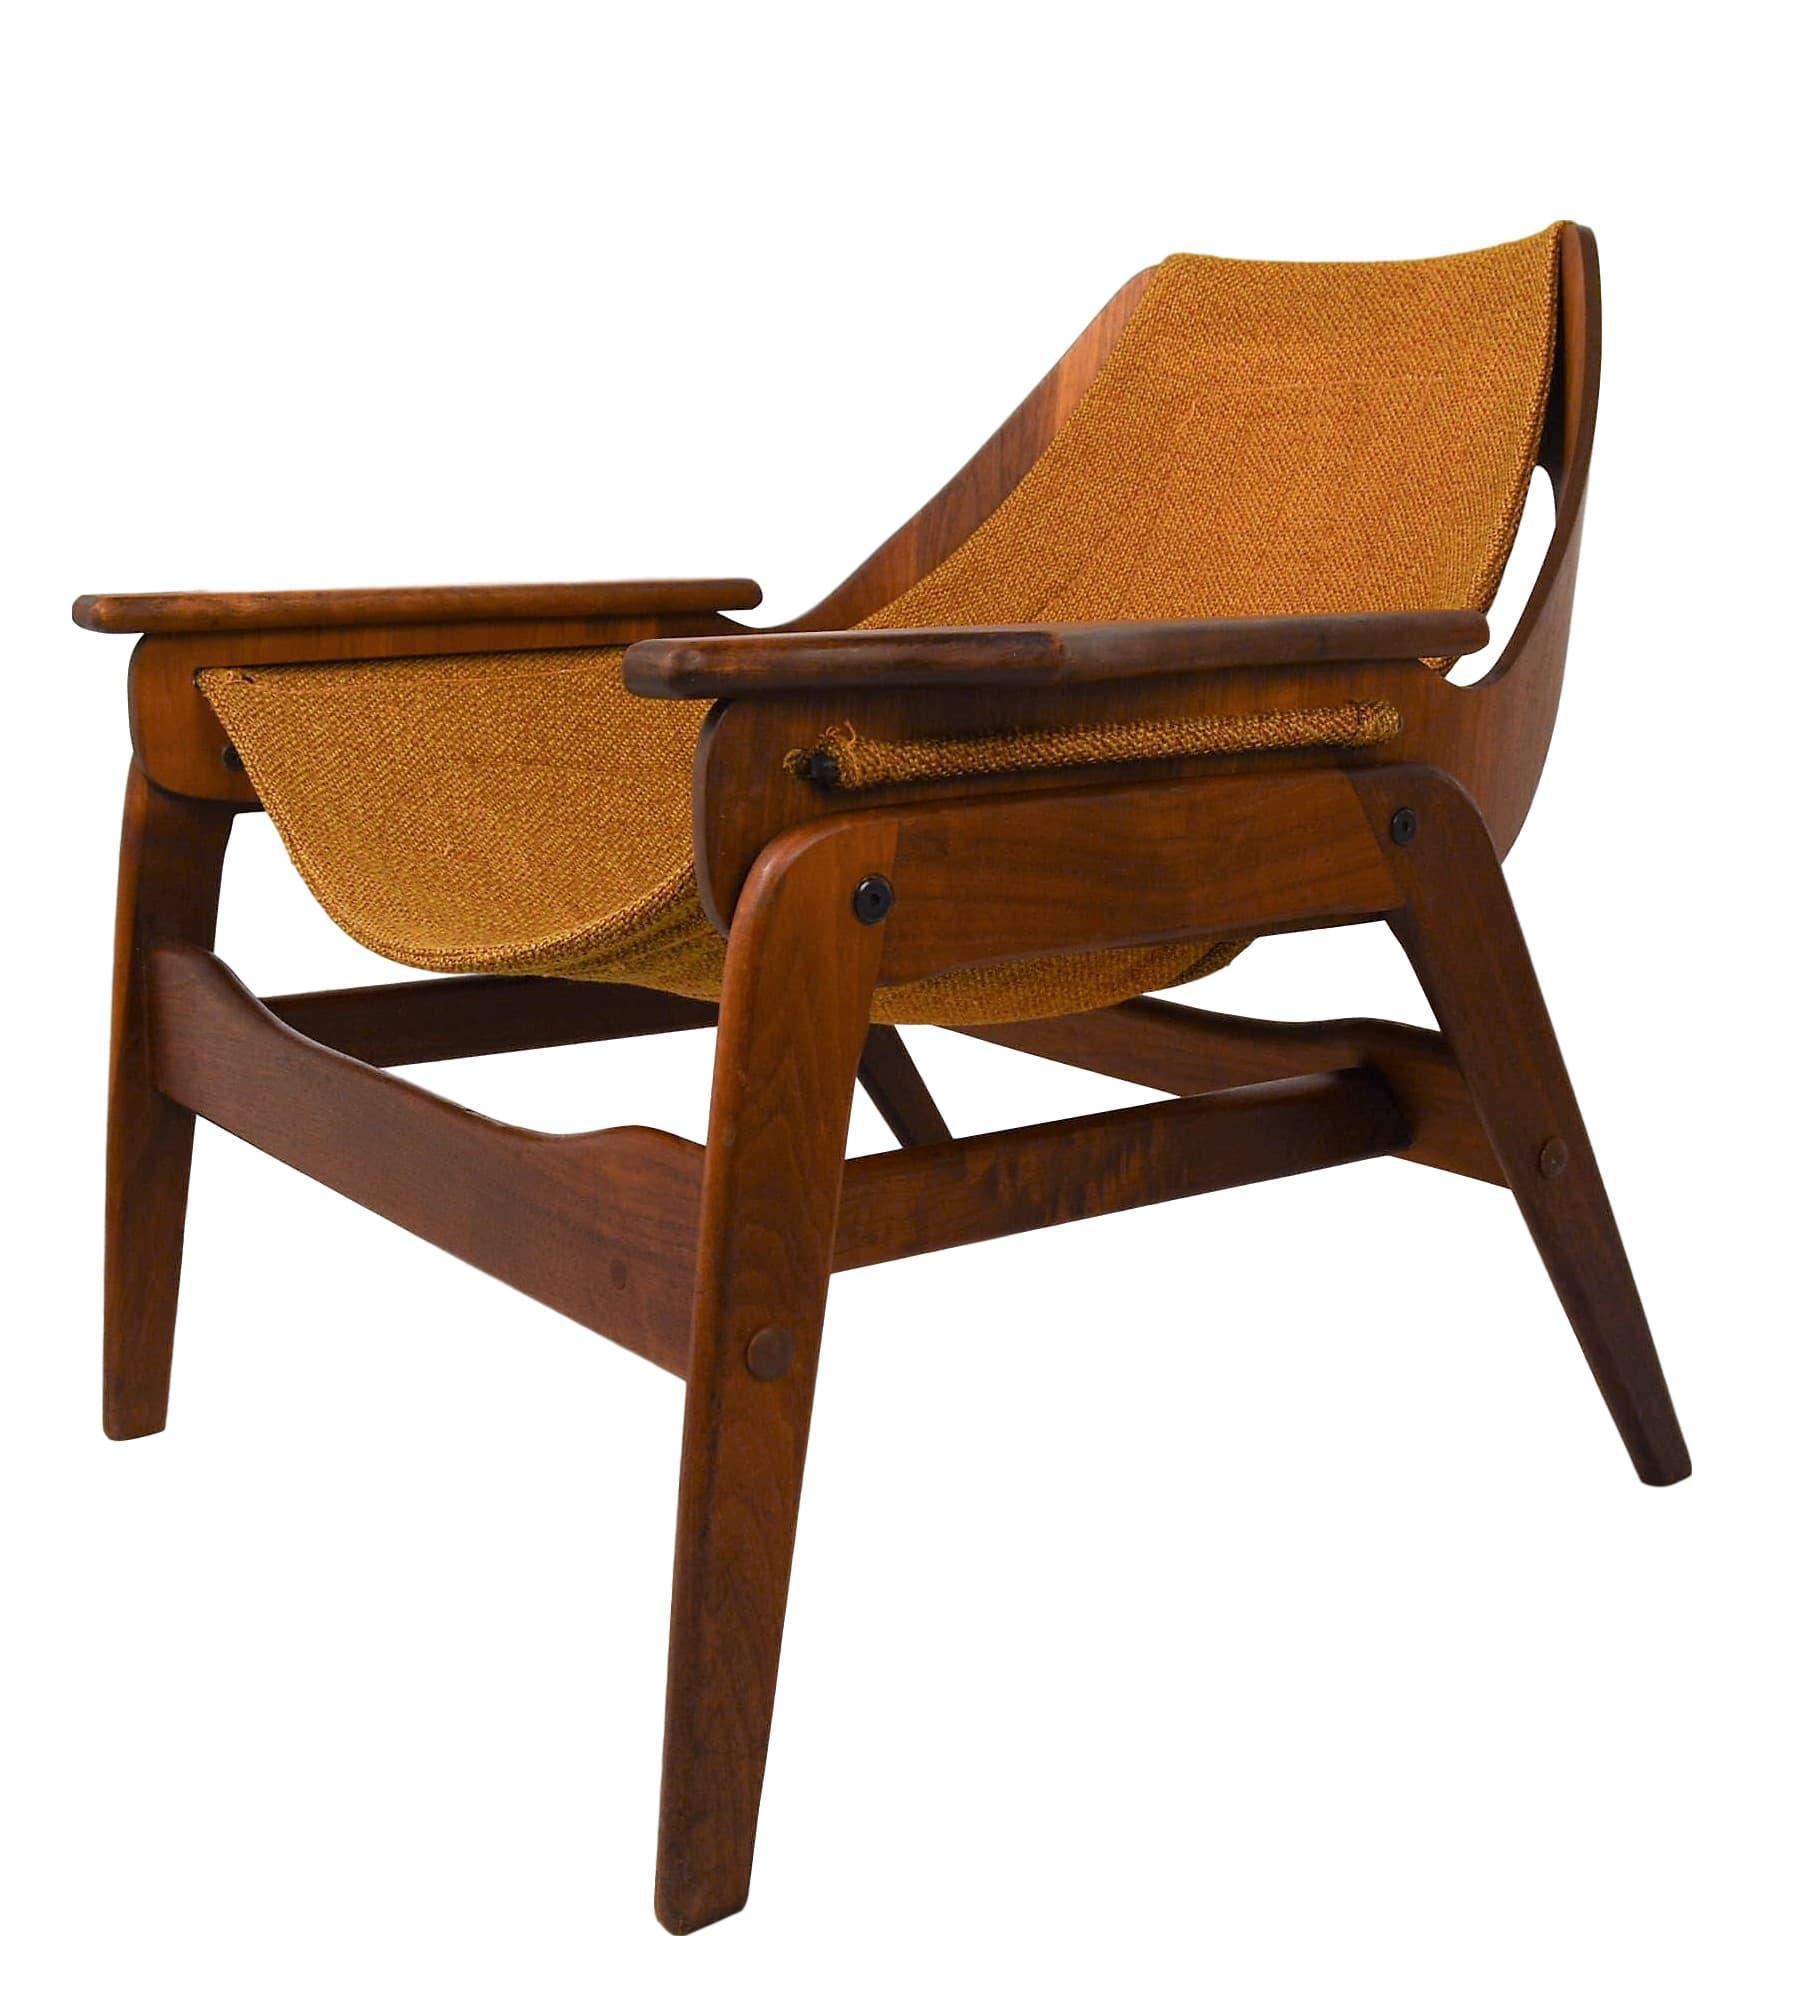 Modern sling chairs - Modern Sling Chairs 49